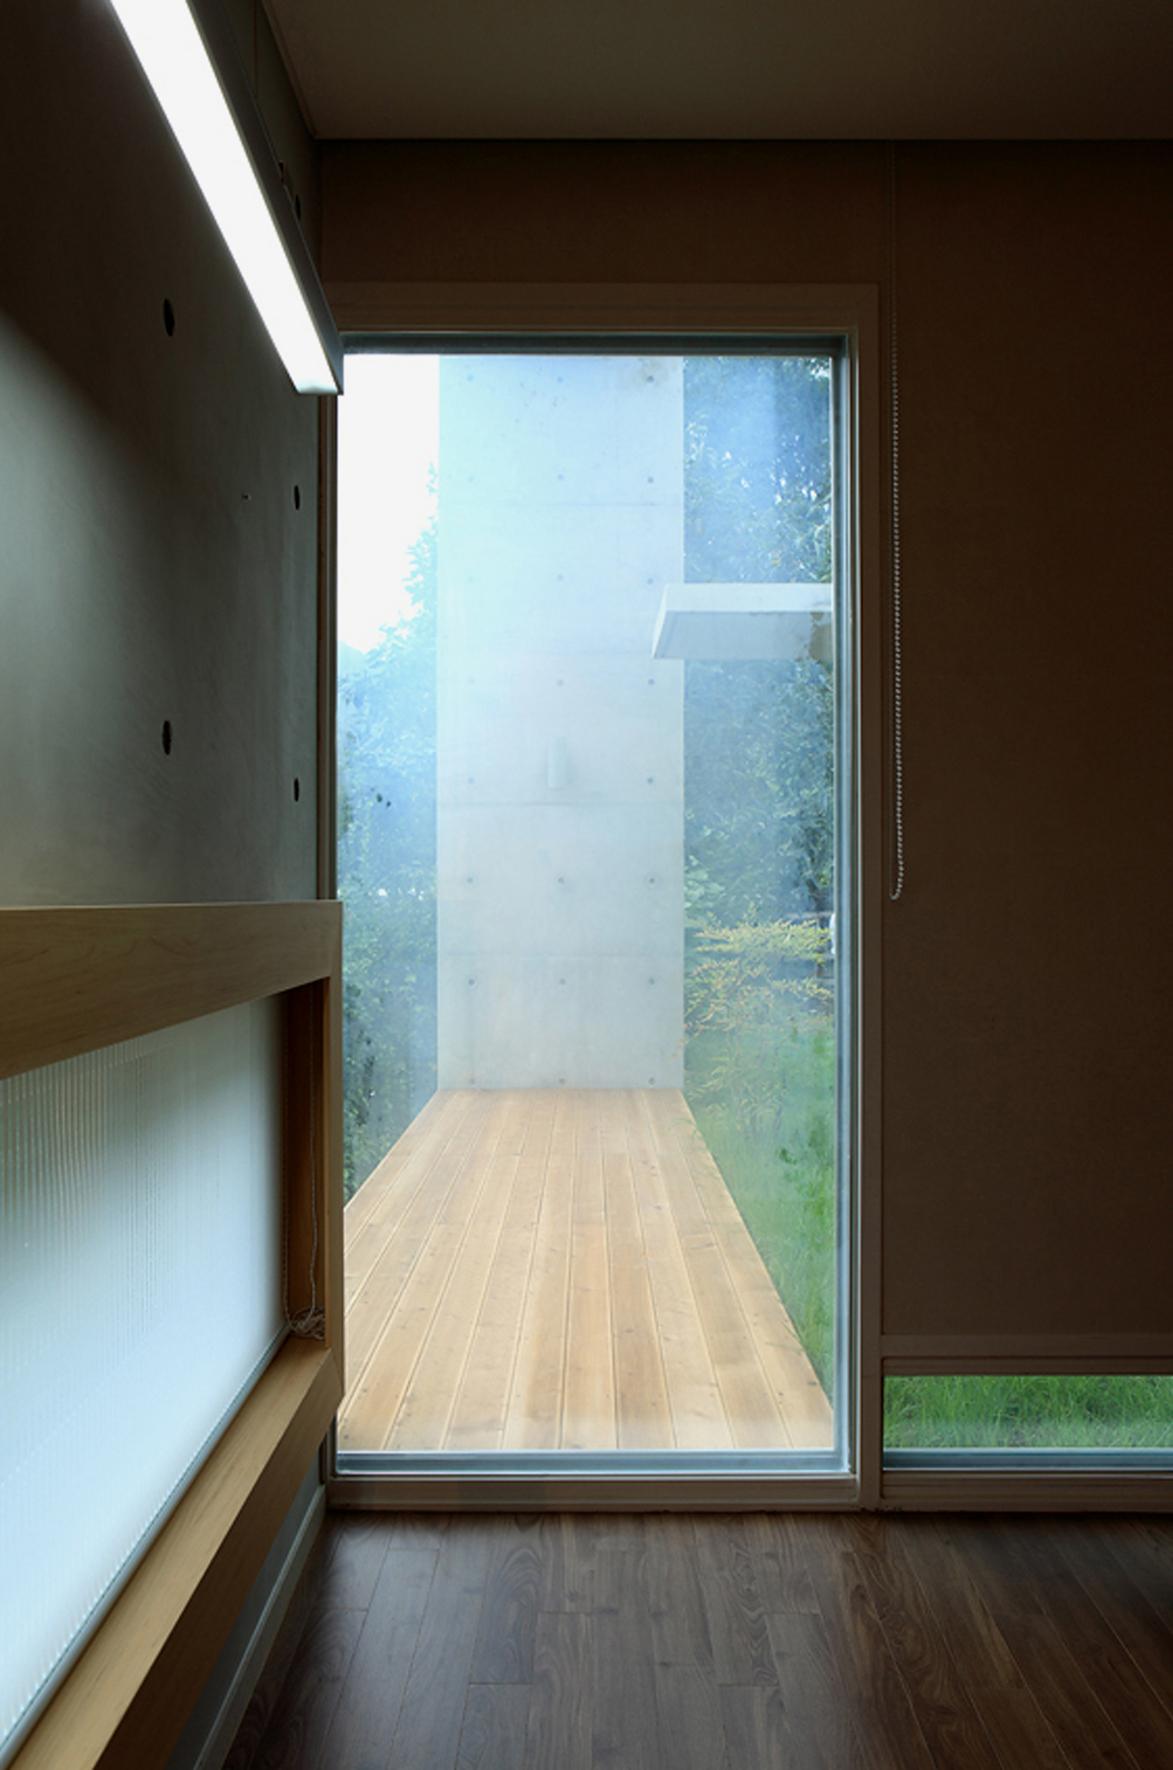 52f1a5d0e8e44e0b6d0000d6_mun-jeong-heon-a-m-architects_a4